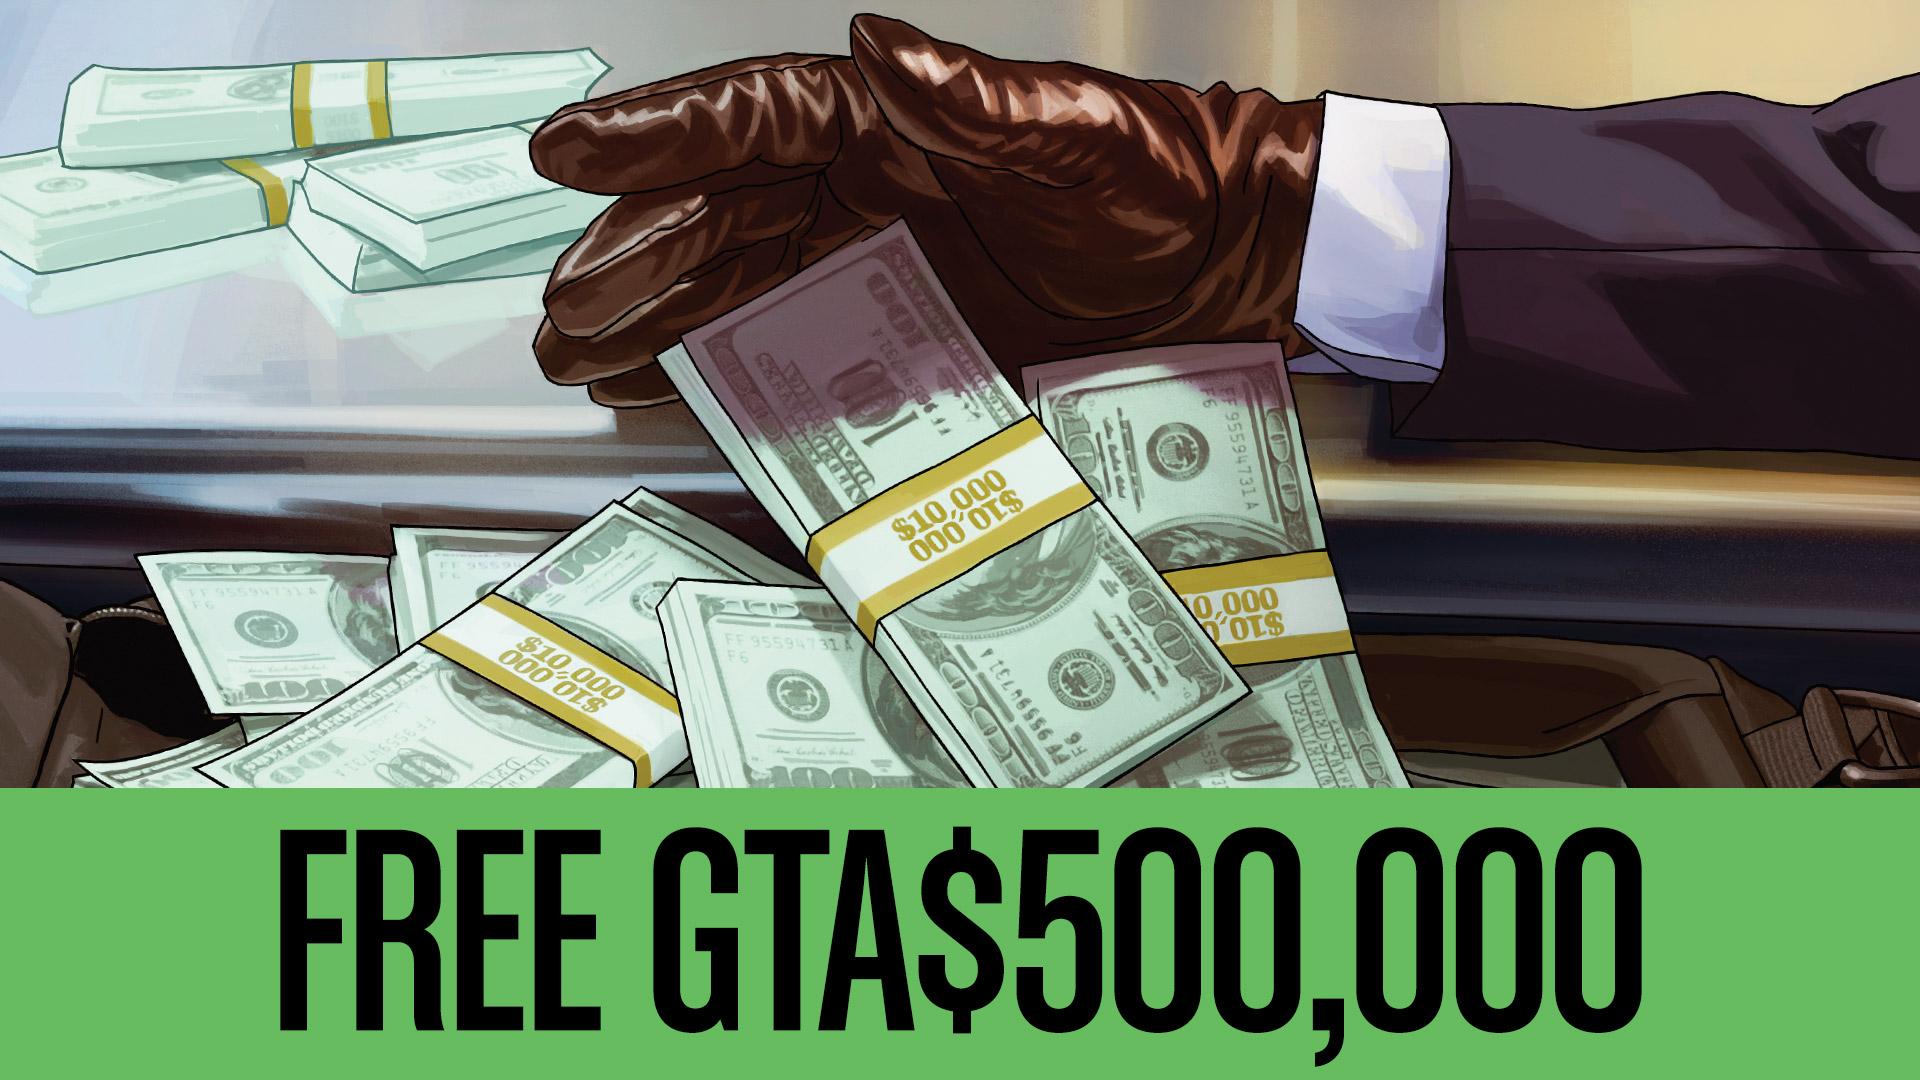 https://media.rockstargames.com/rockstargames-newsite/uploads/gtaonline/event197/gift.jpg